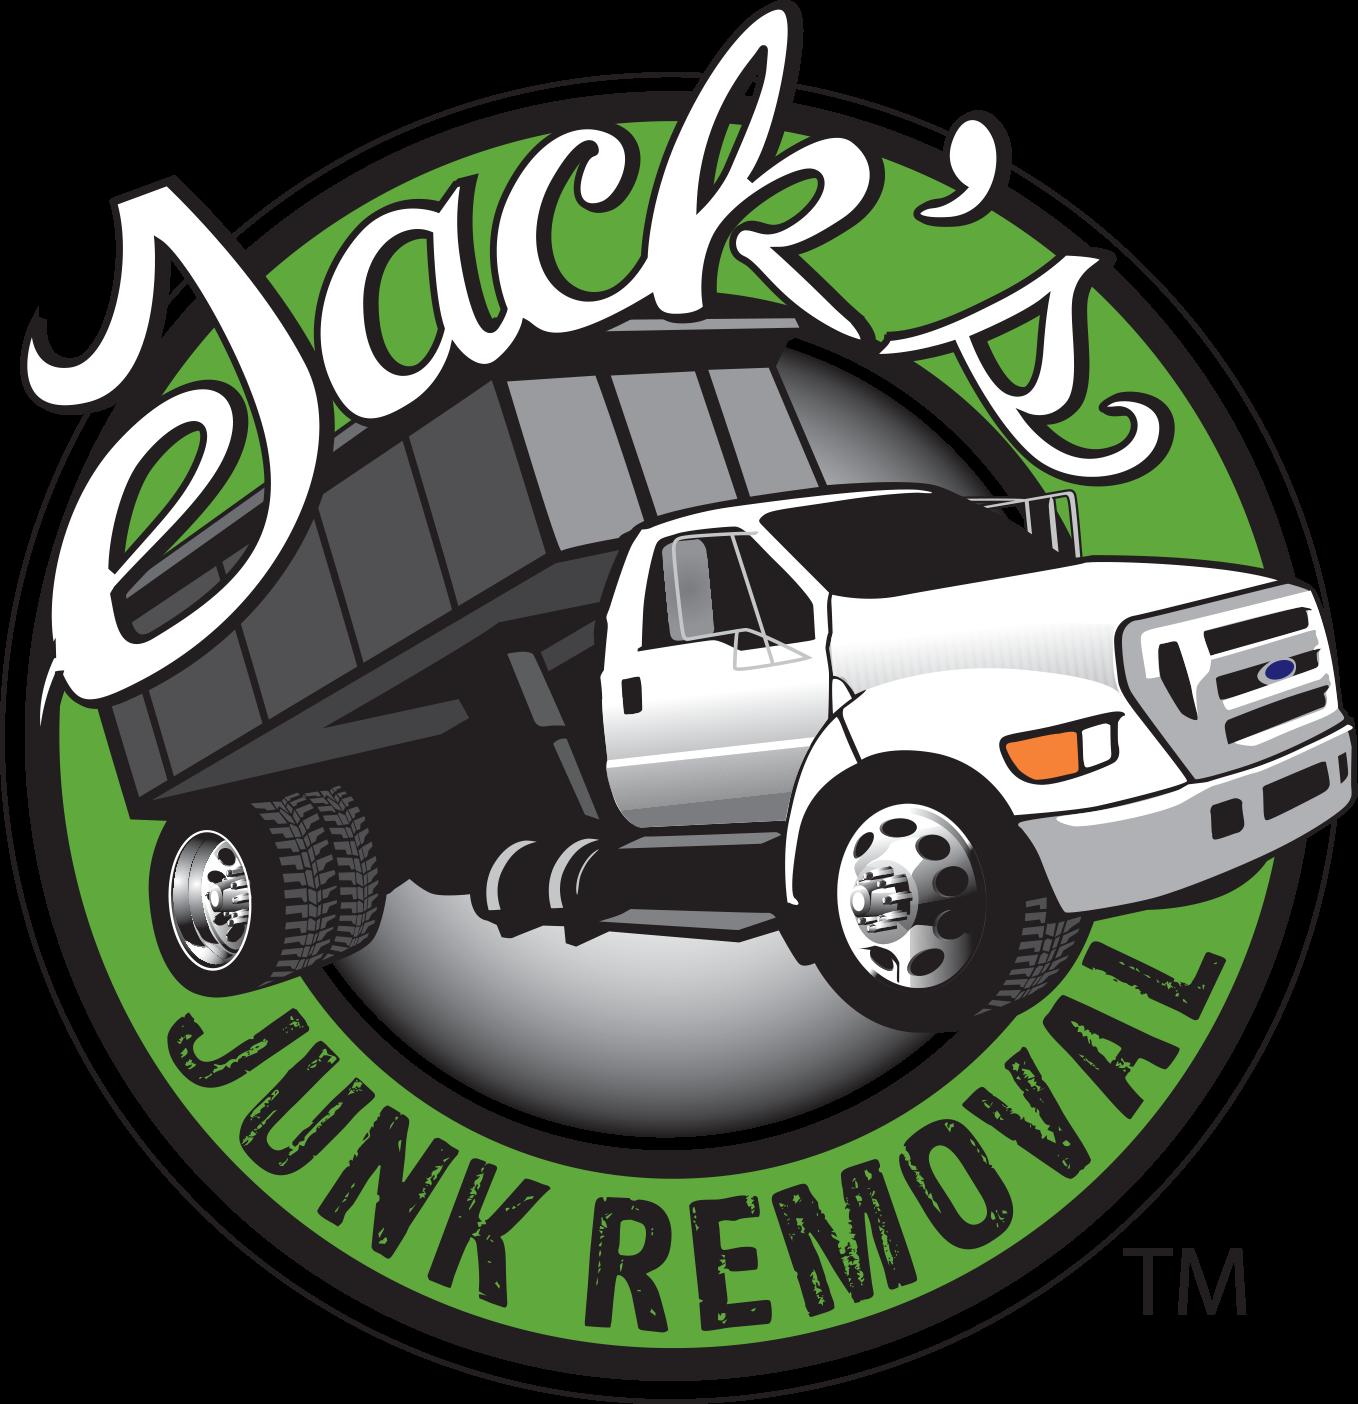 Jack's Junk Removal logo